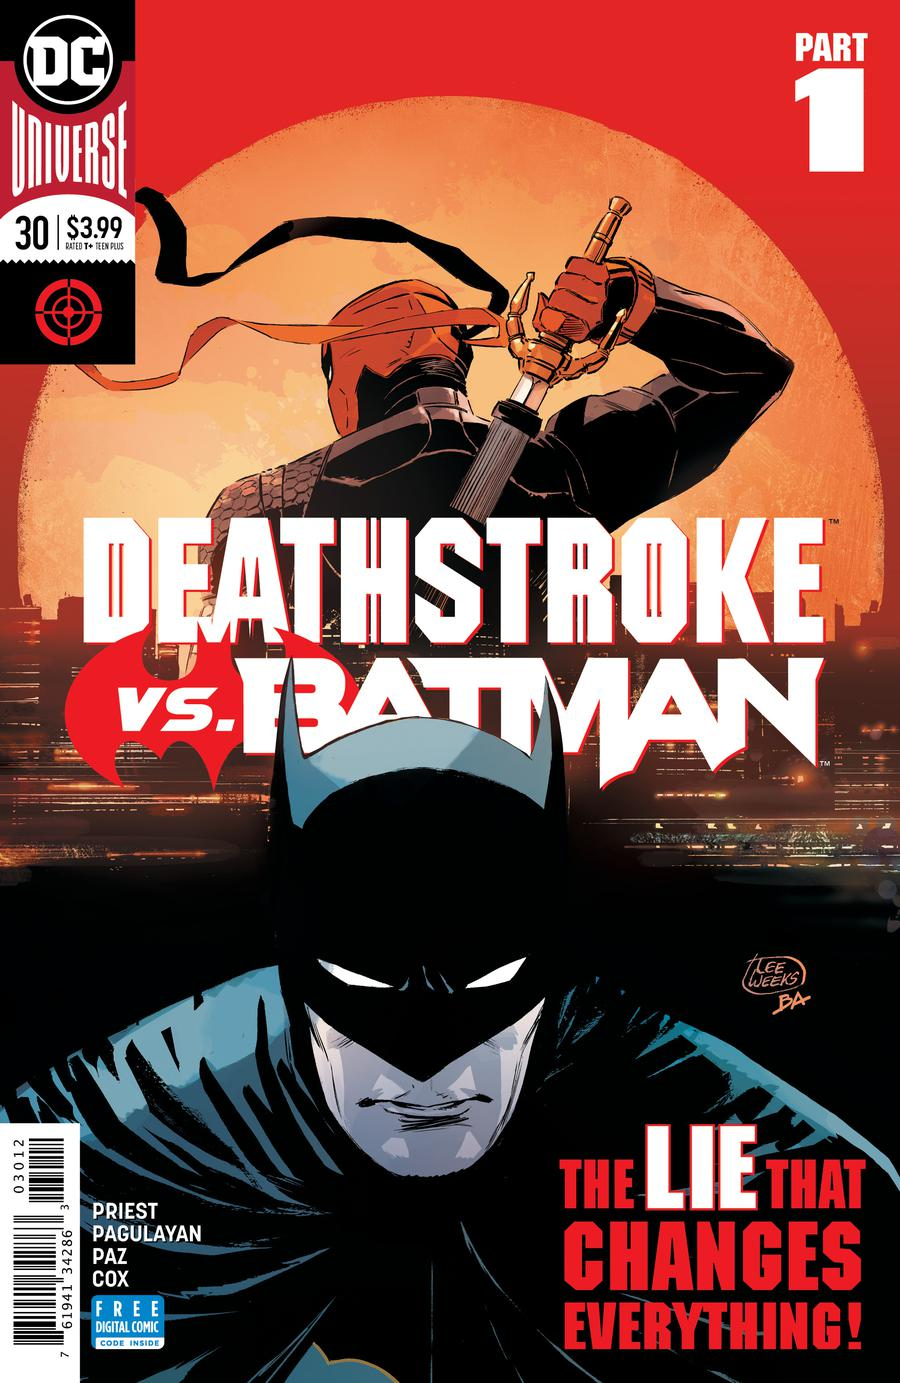 Deathstroke Vol 4 #30 Cover C 2nd Ptg Variant Lee Weeks Cover